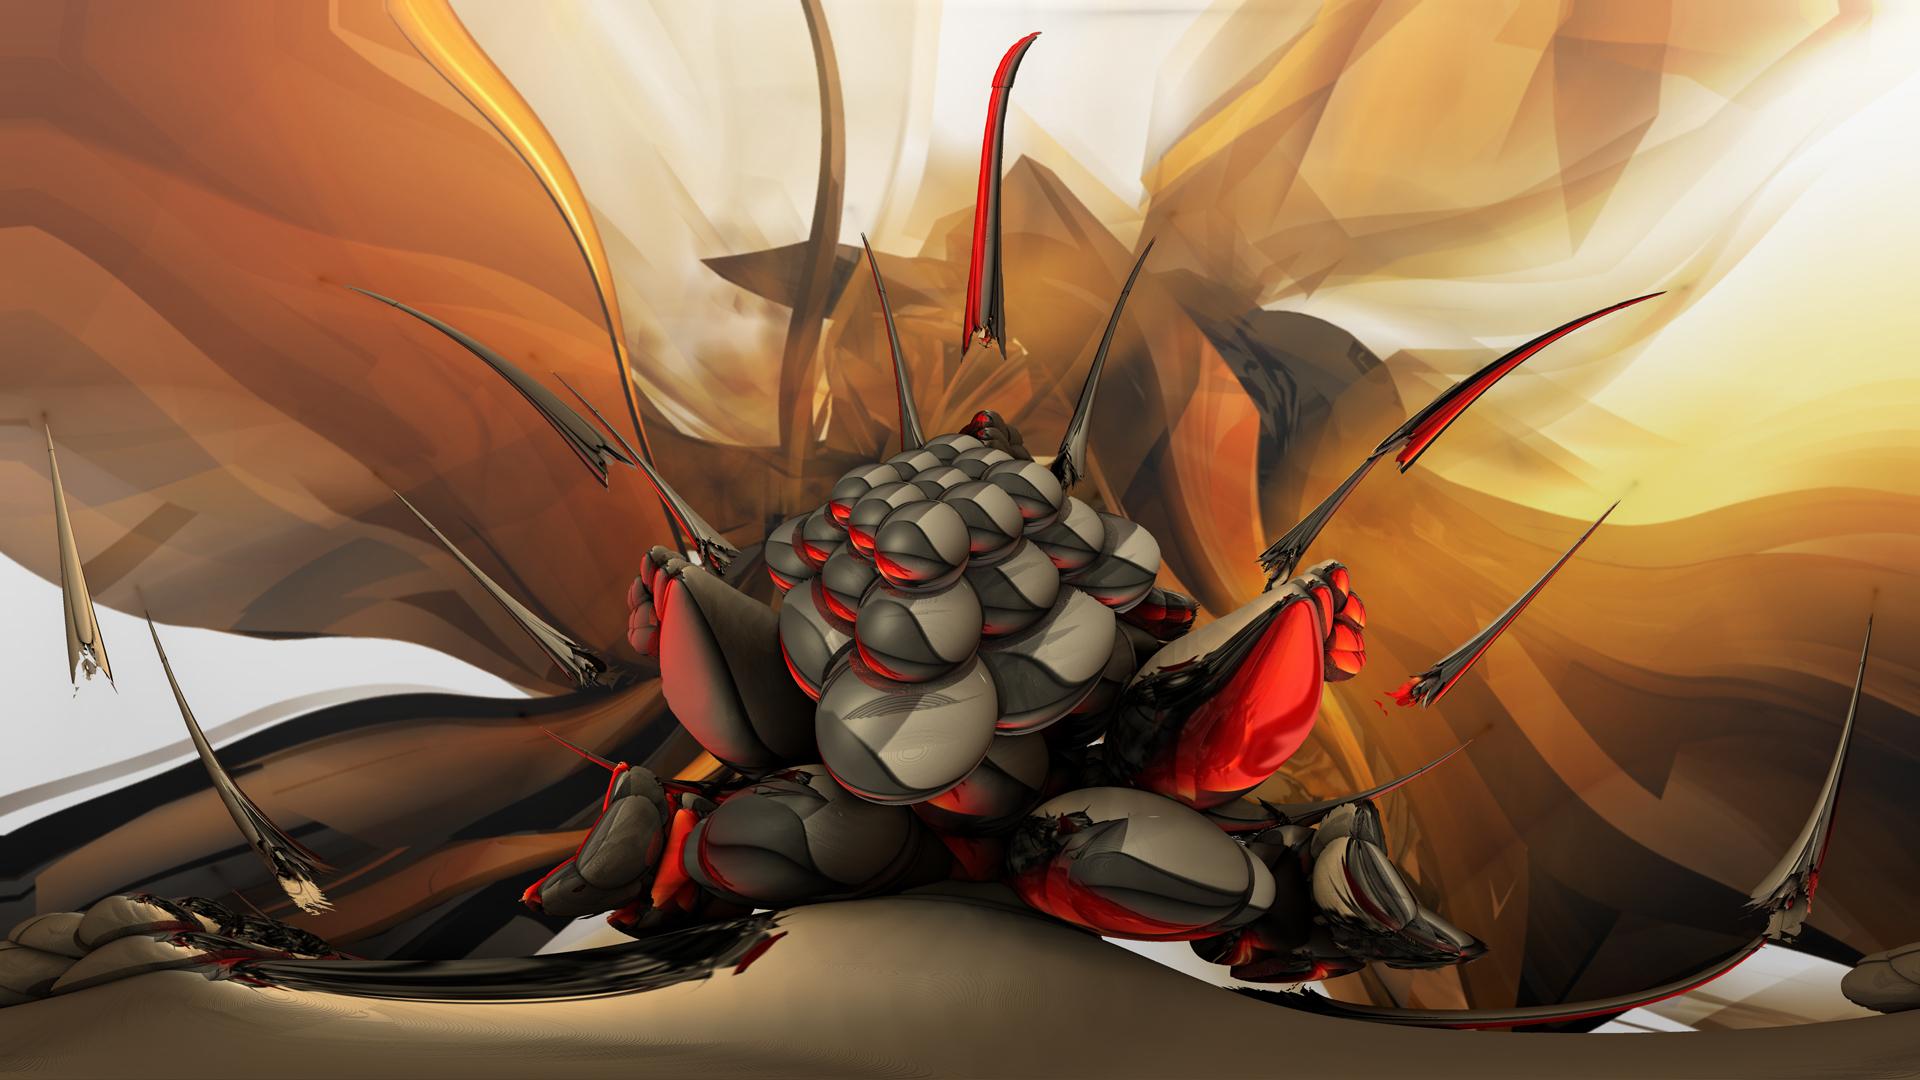 Crippled Blob by viperv6